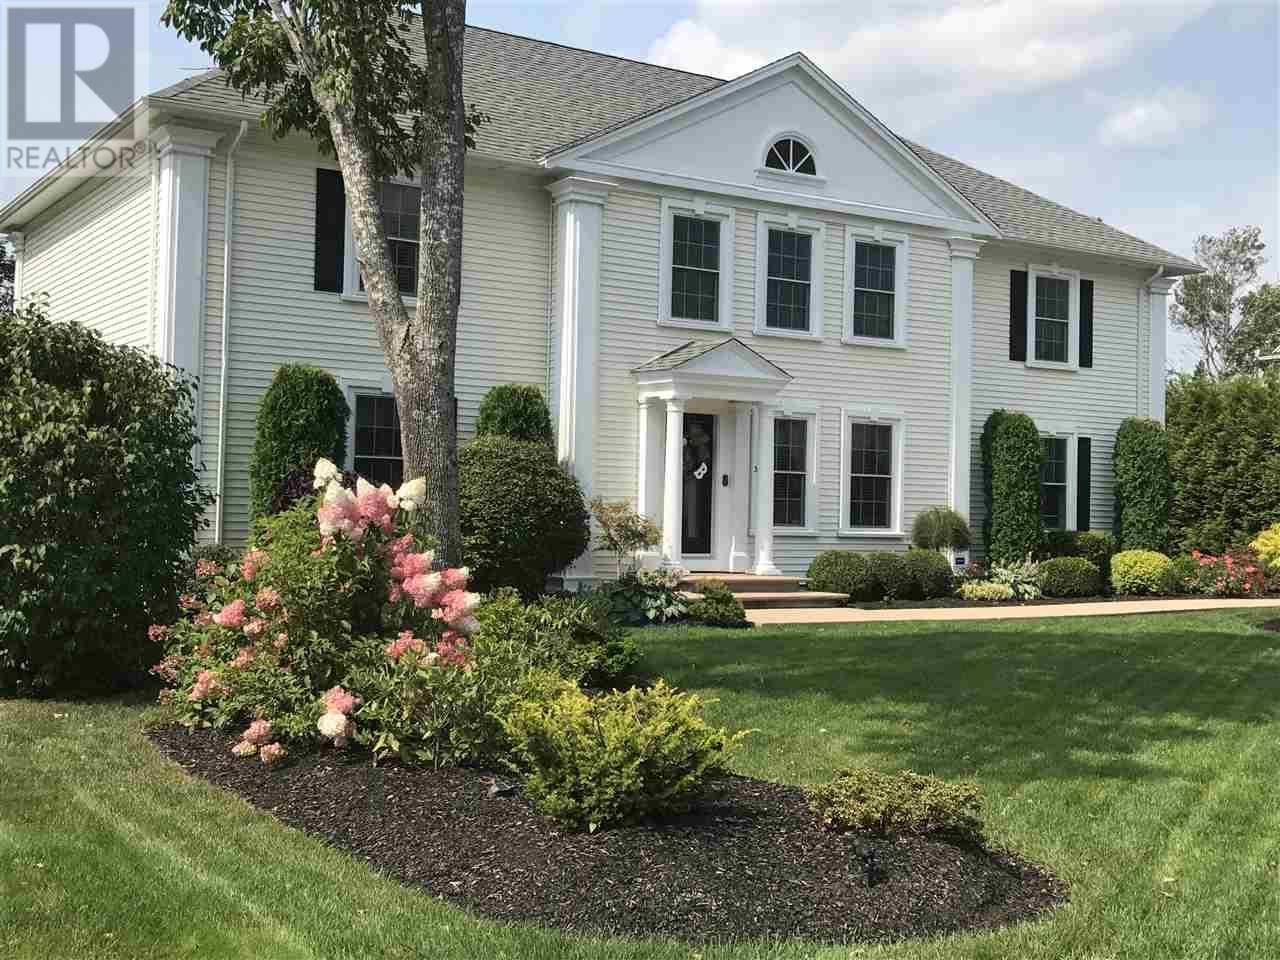 House for sale at 37 Acadia Dr Kentville Nova Scotia - MLS: 202002519